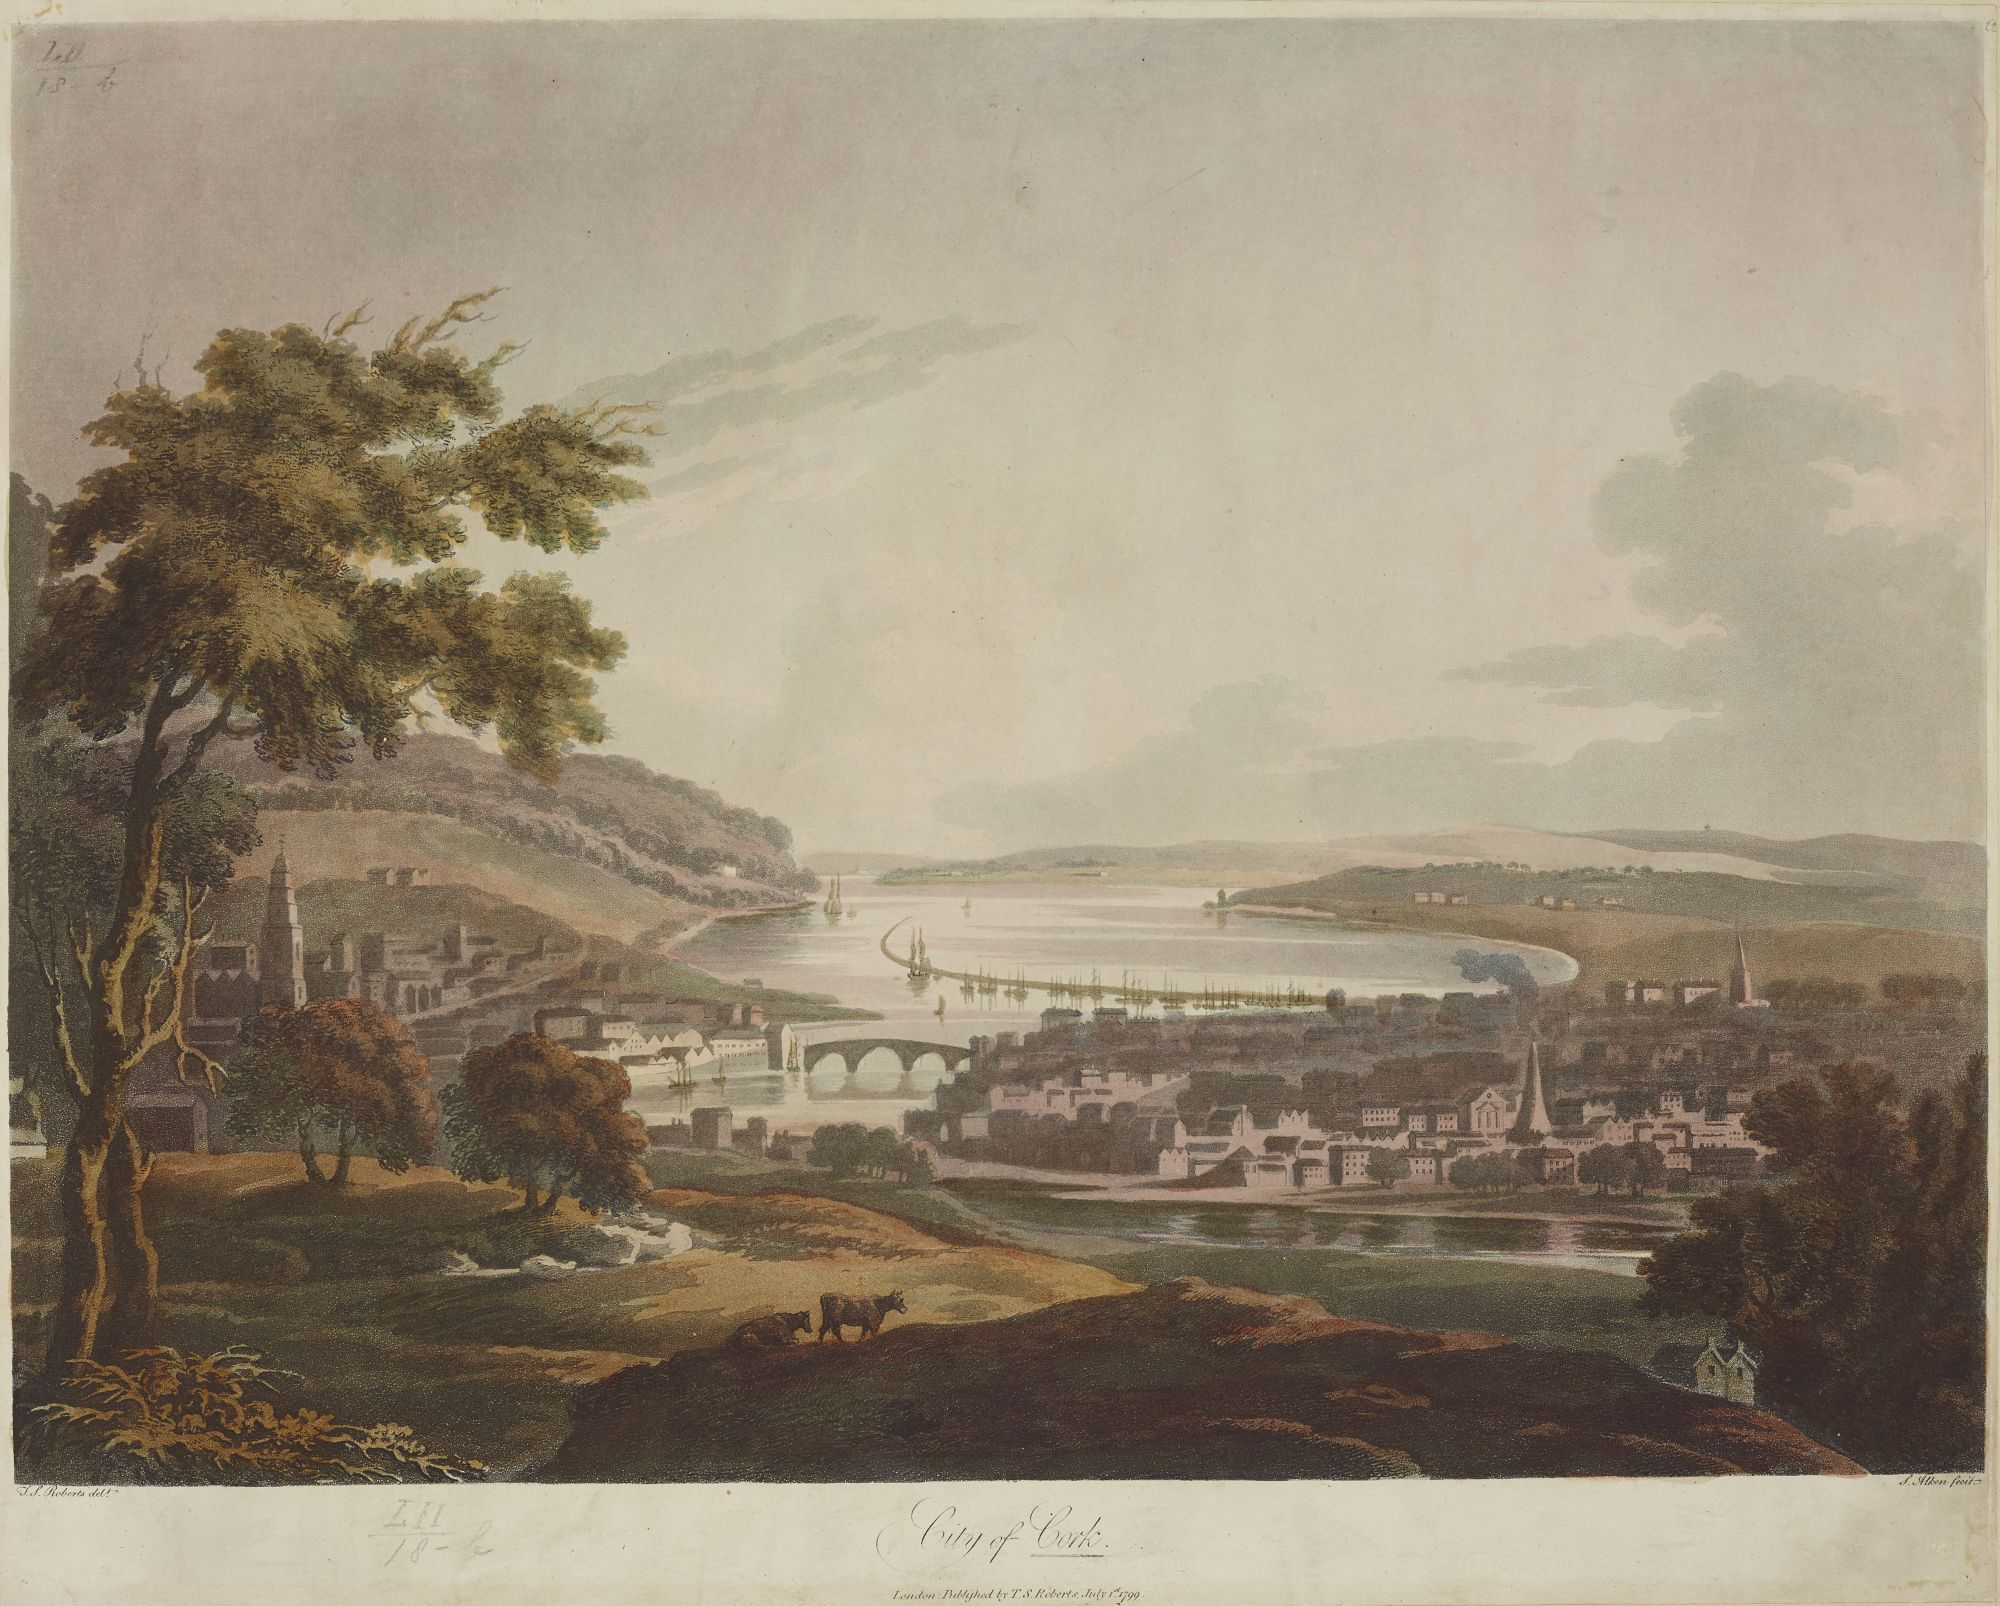 City of Cork, by Samuel Alken after Thomas Sautelle Roberts.